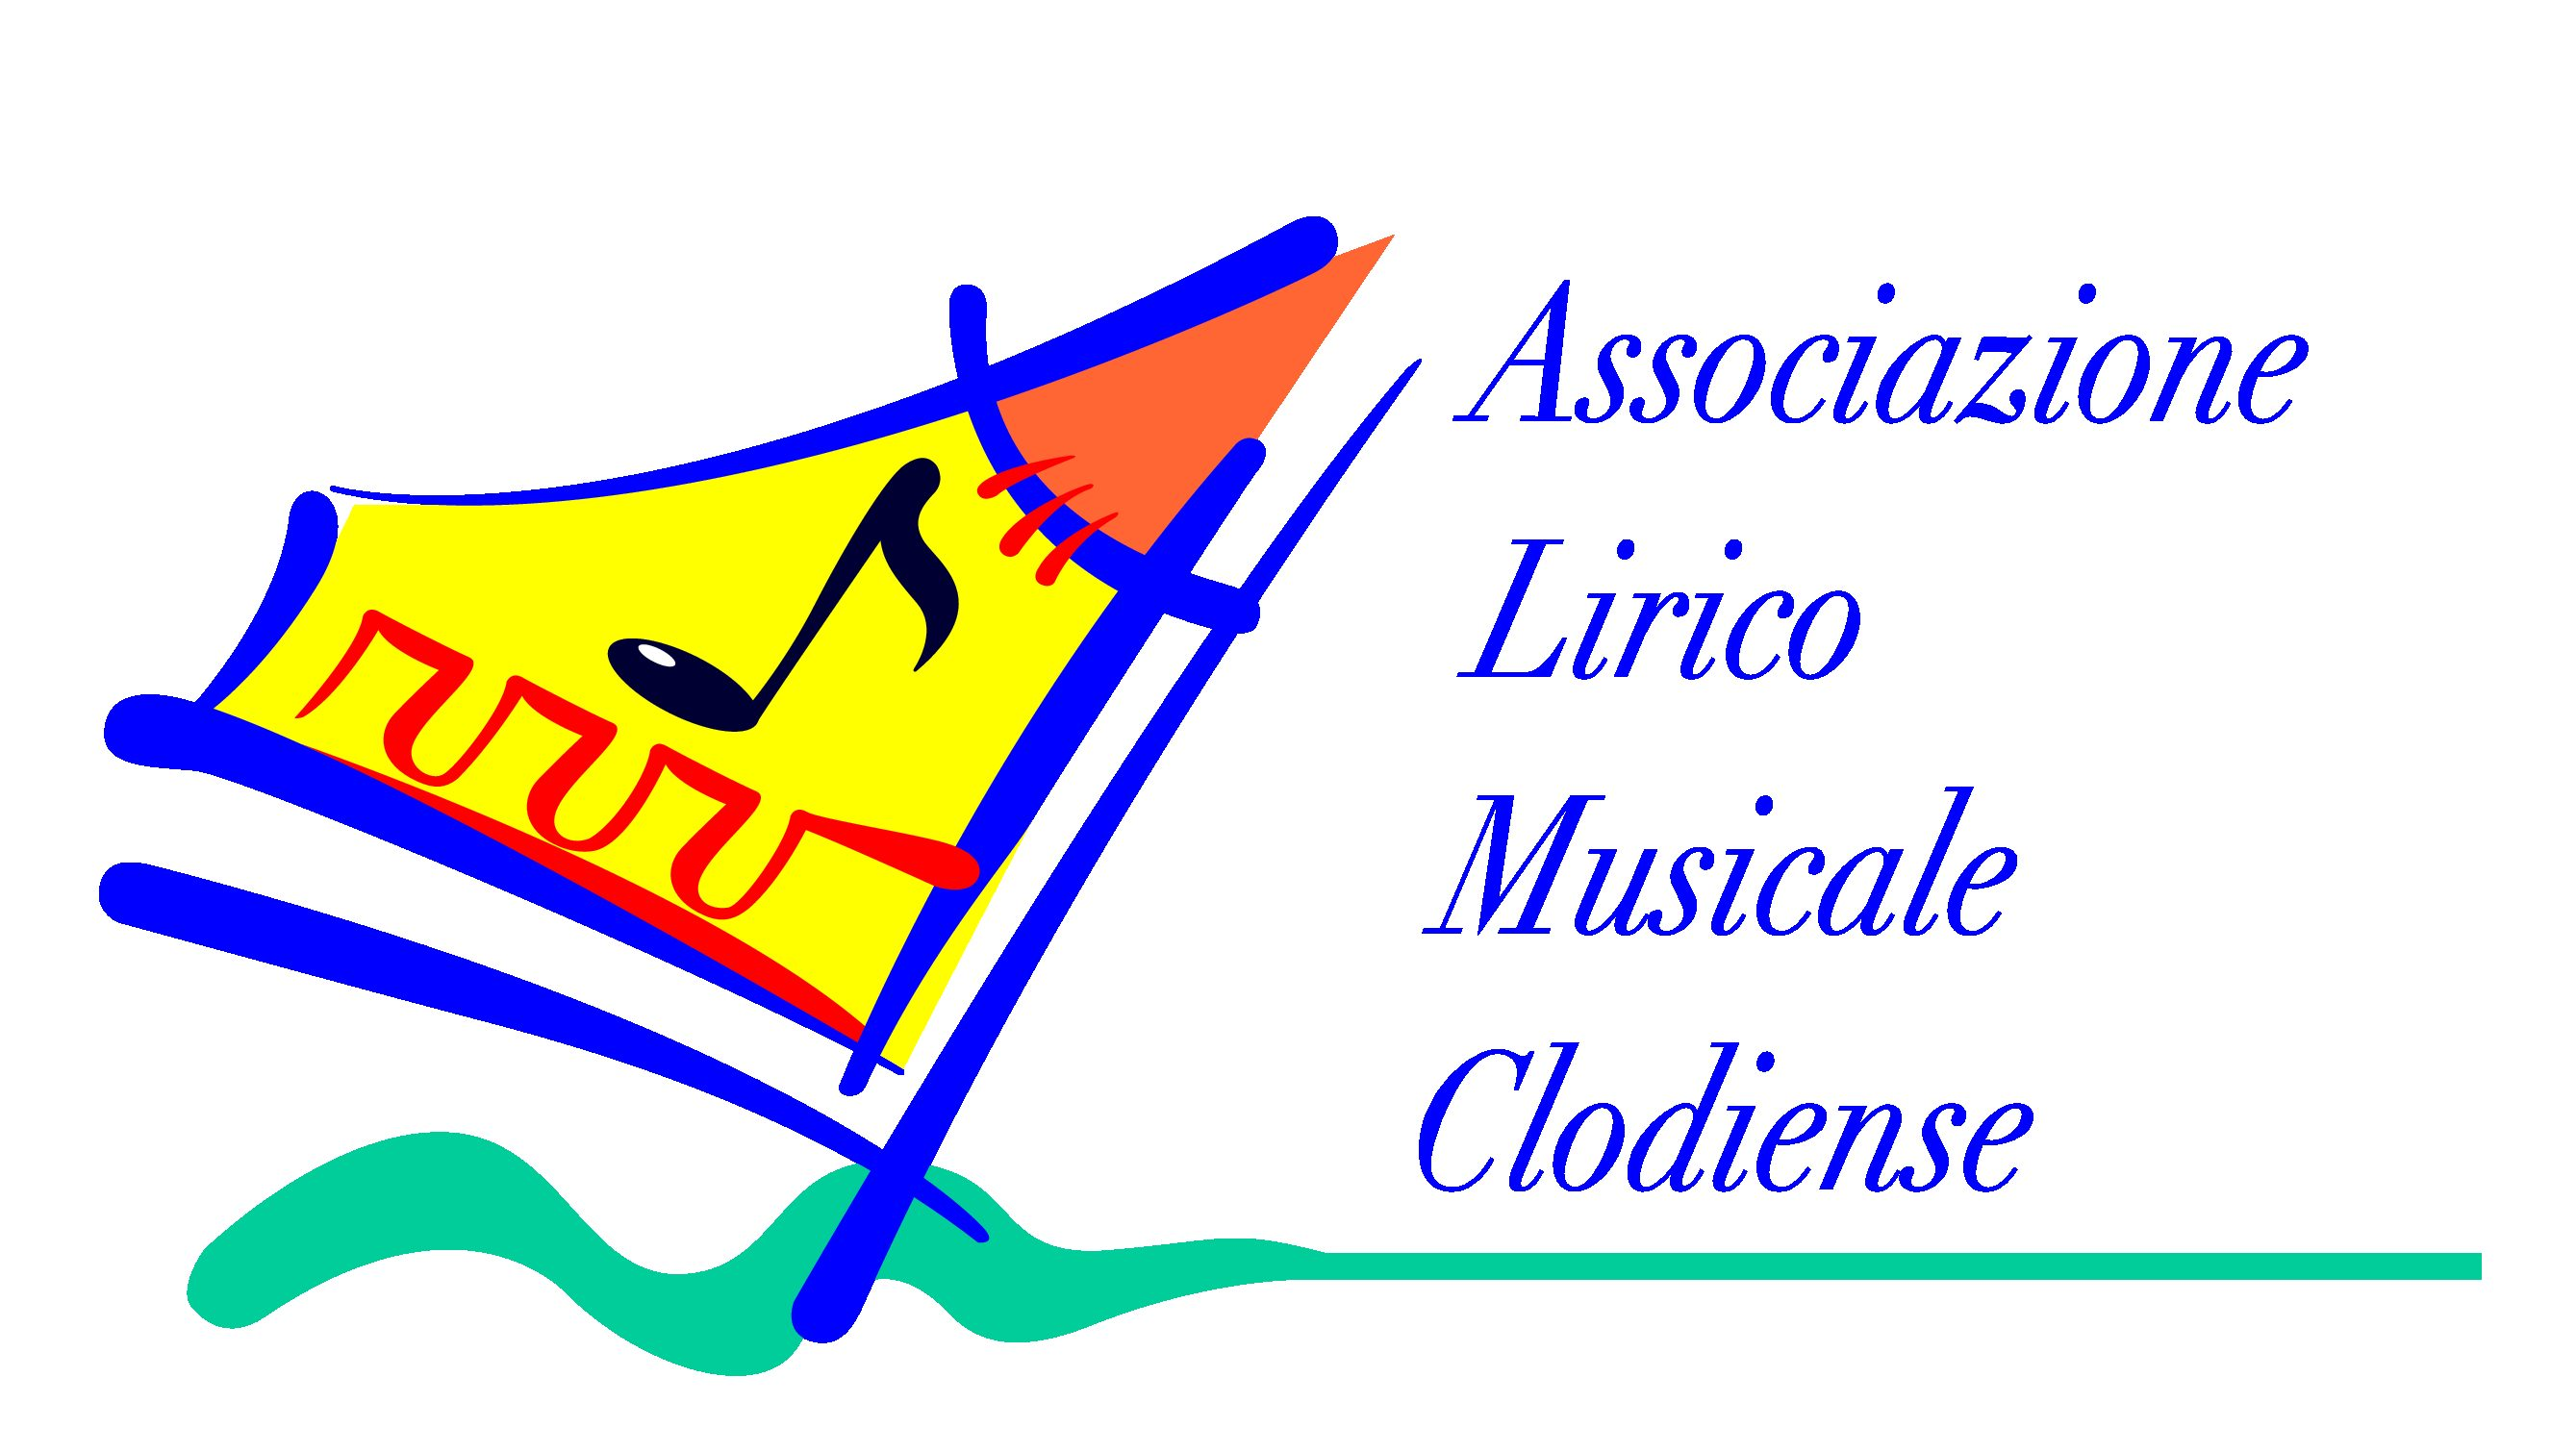 Associazione Lirico Musicale Clodiense